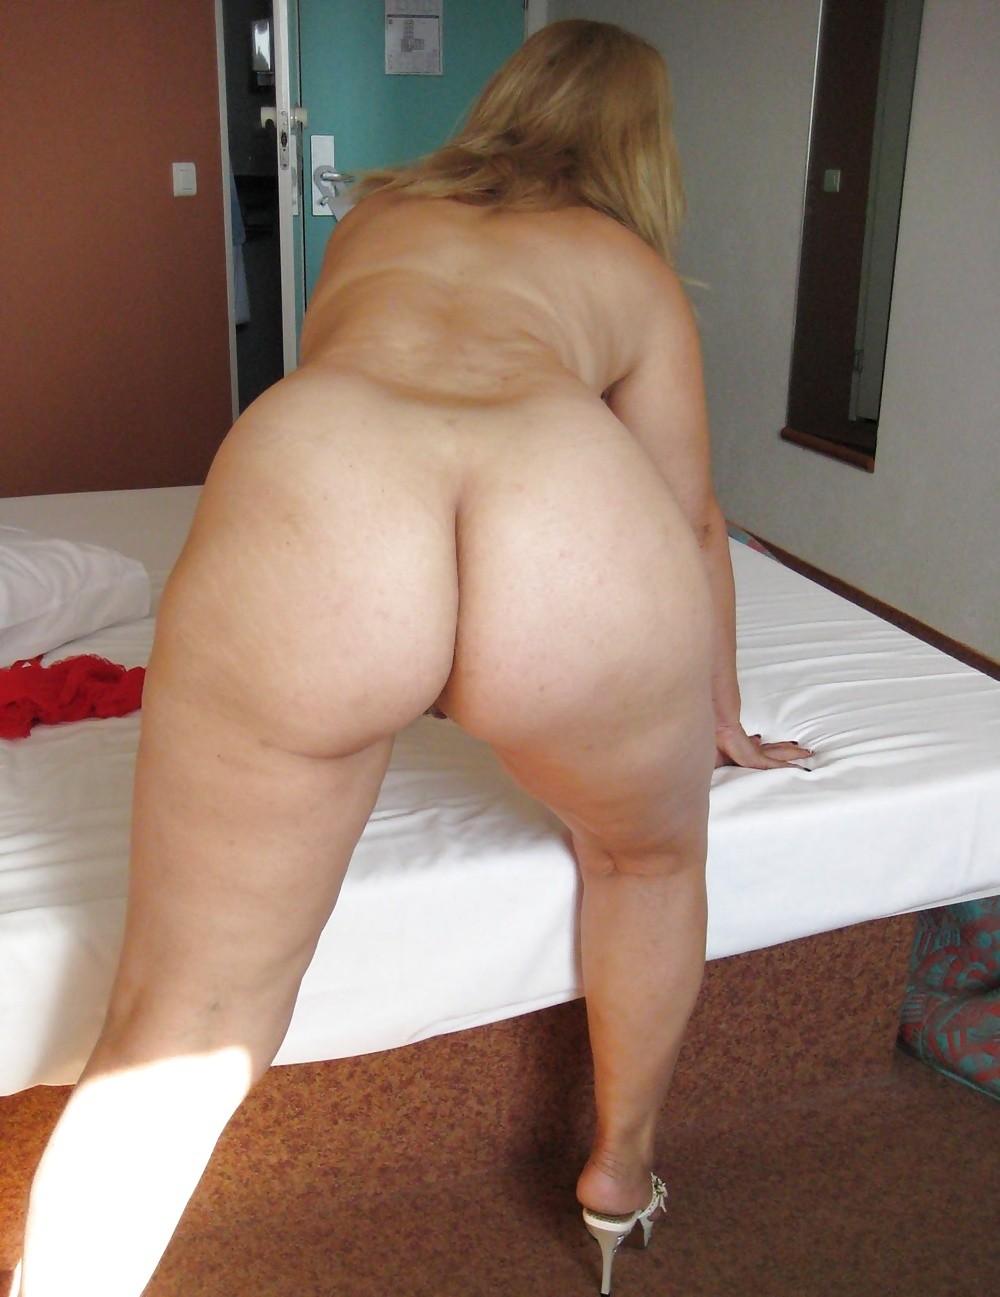 Butt sex gay free